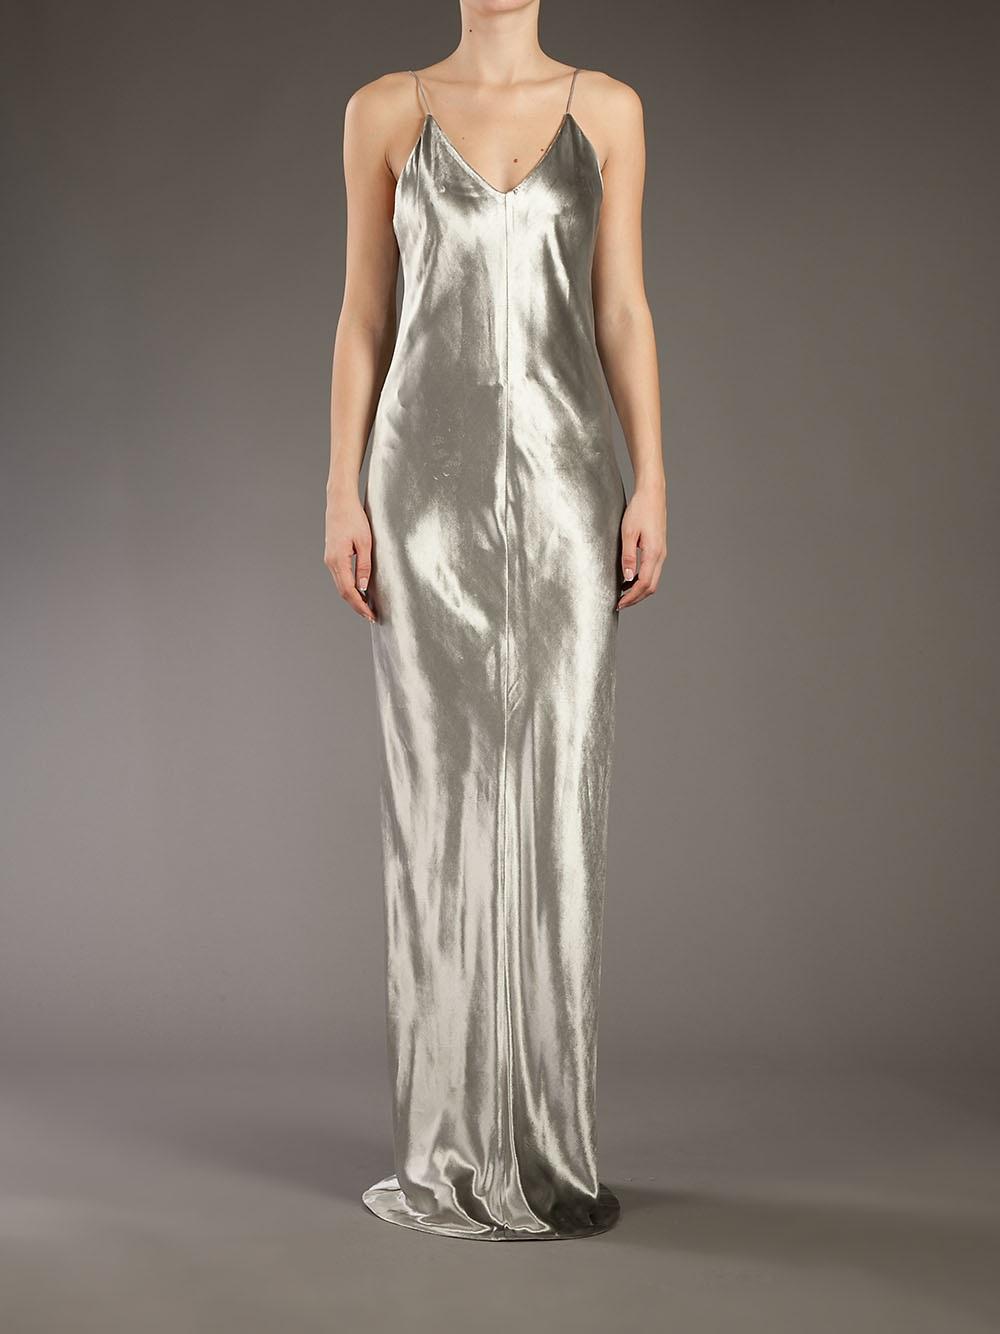 T By Alexander Wang Metallic Evening Dress In Silver Grey